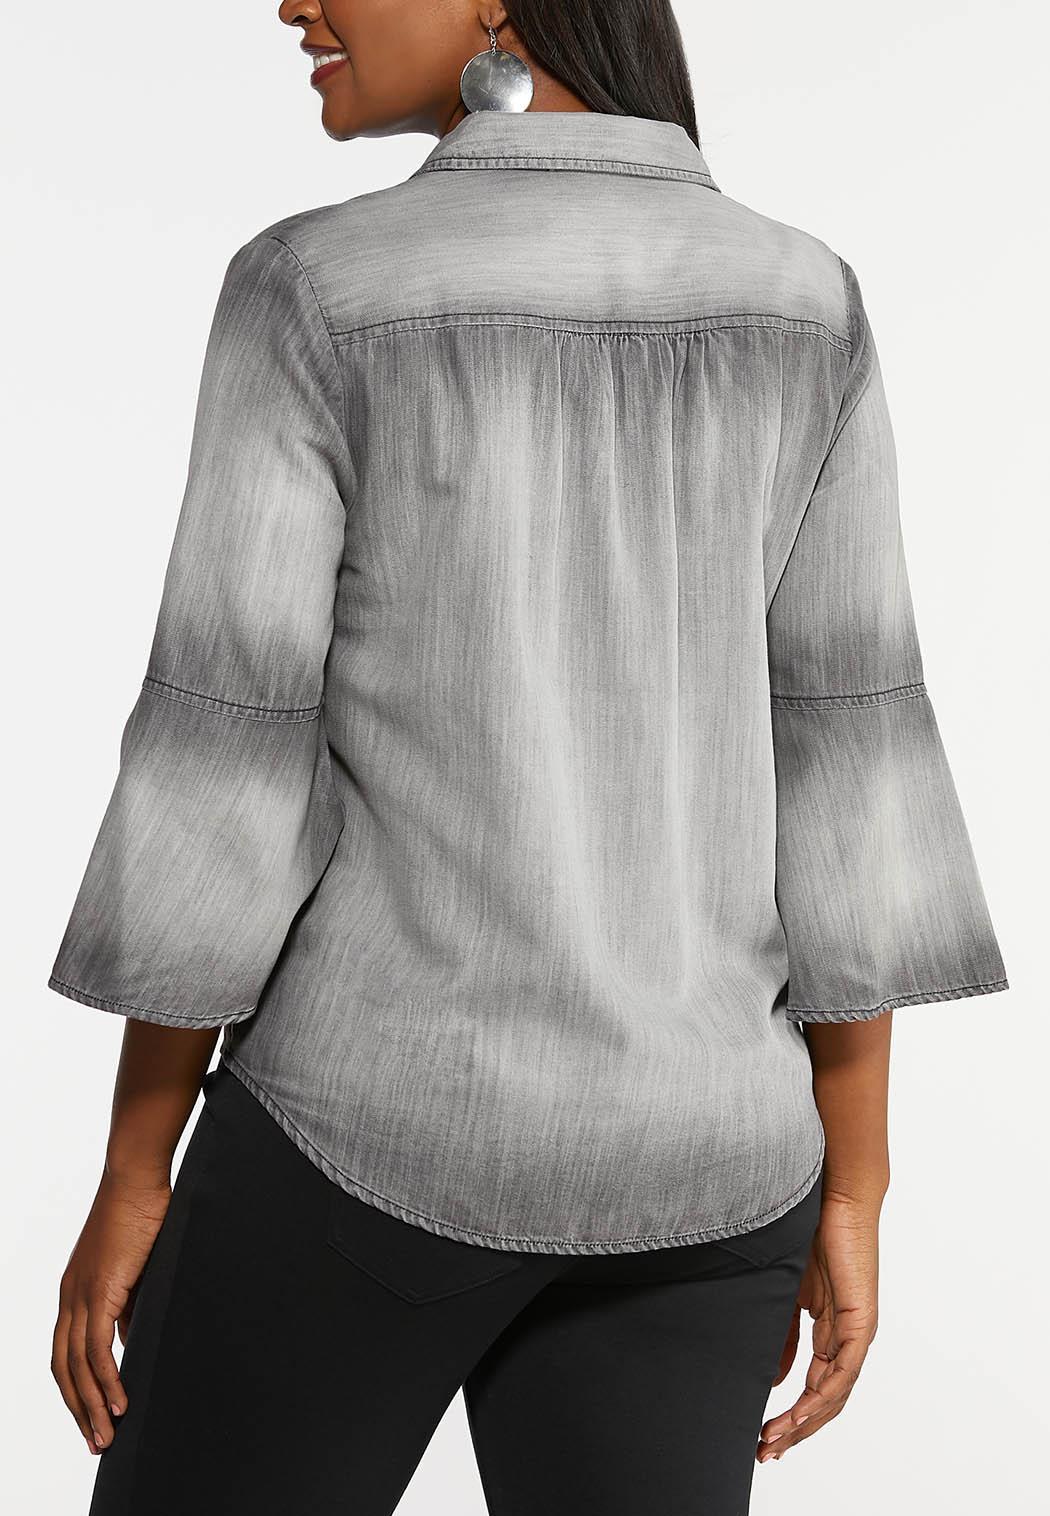 Gray Chambray Tie Top (Item #44005086)